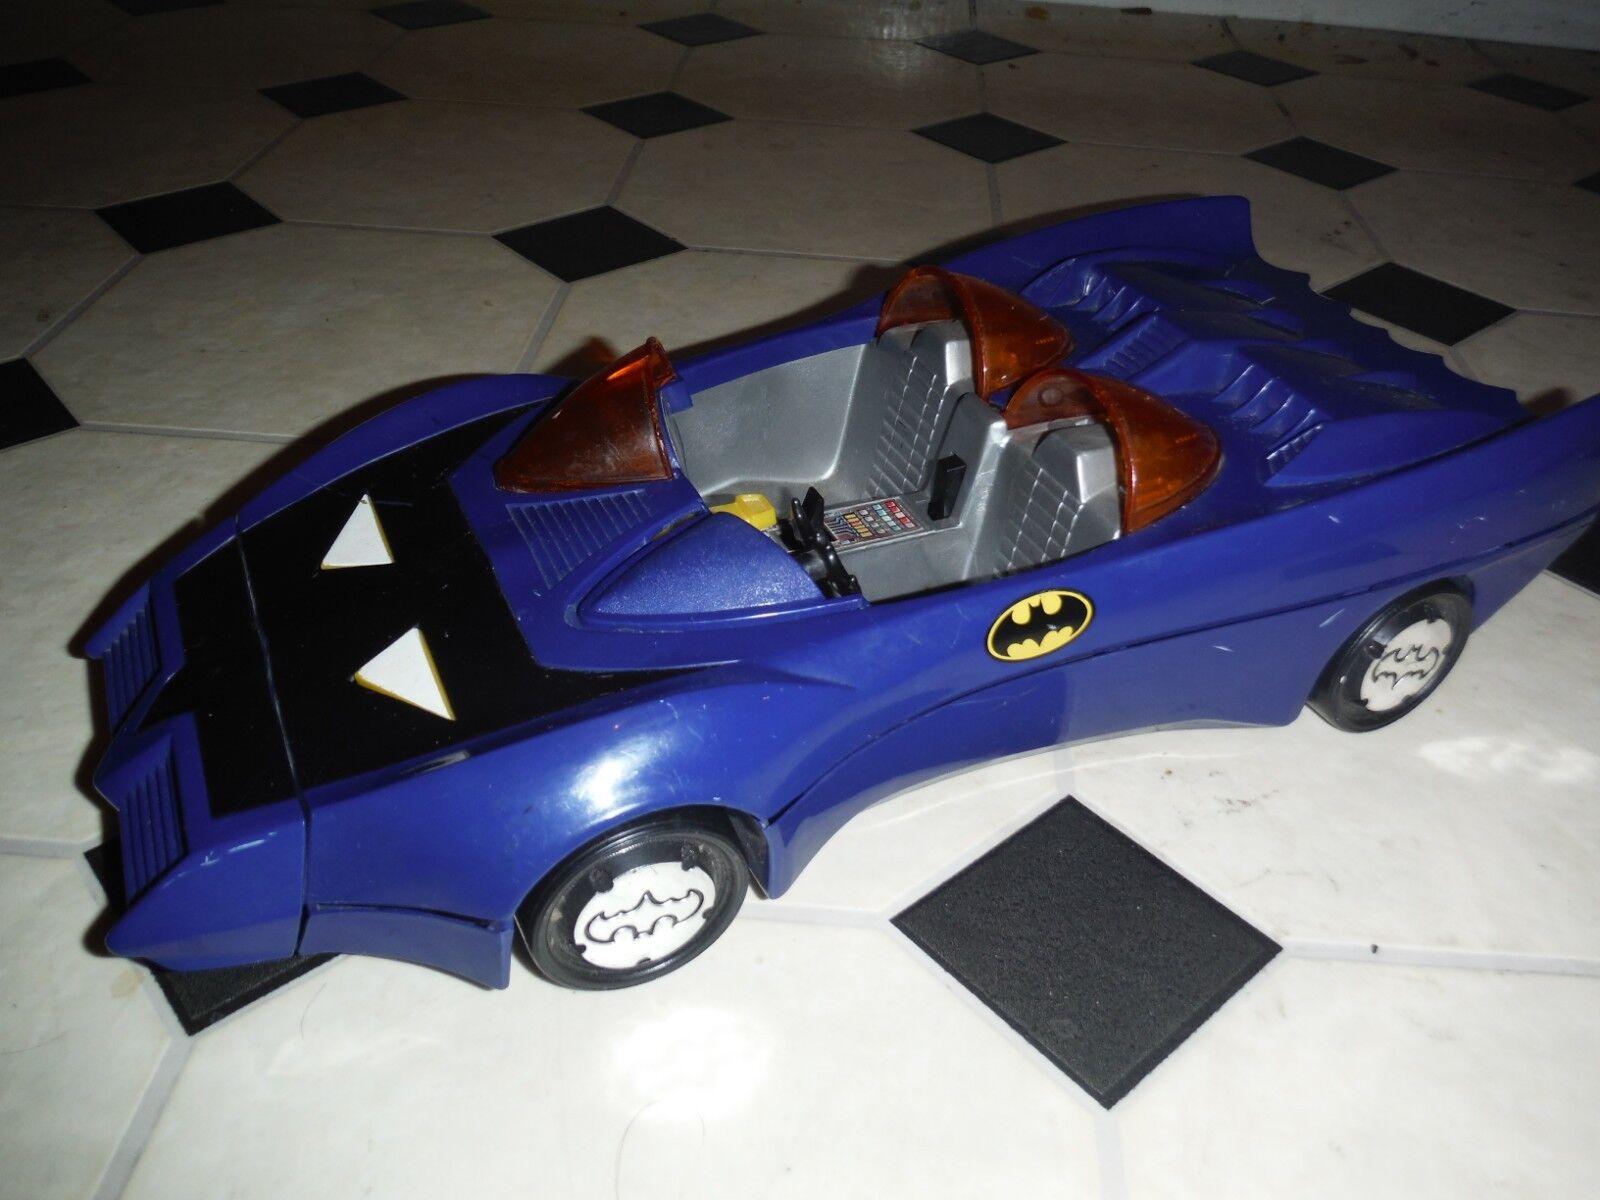 1984 Kenner Super Powers Batmobile